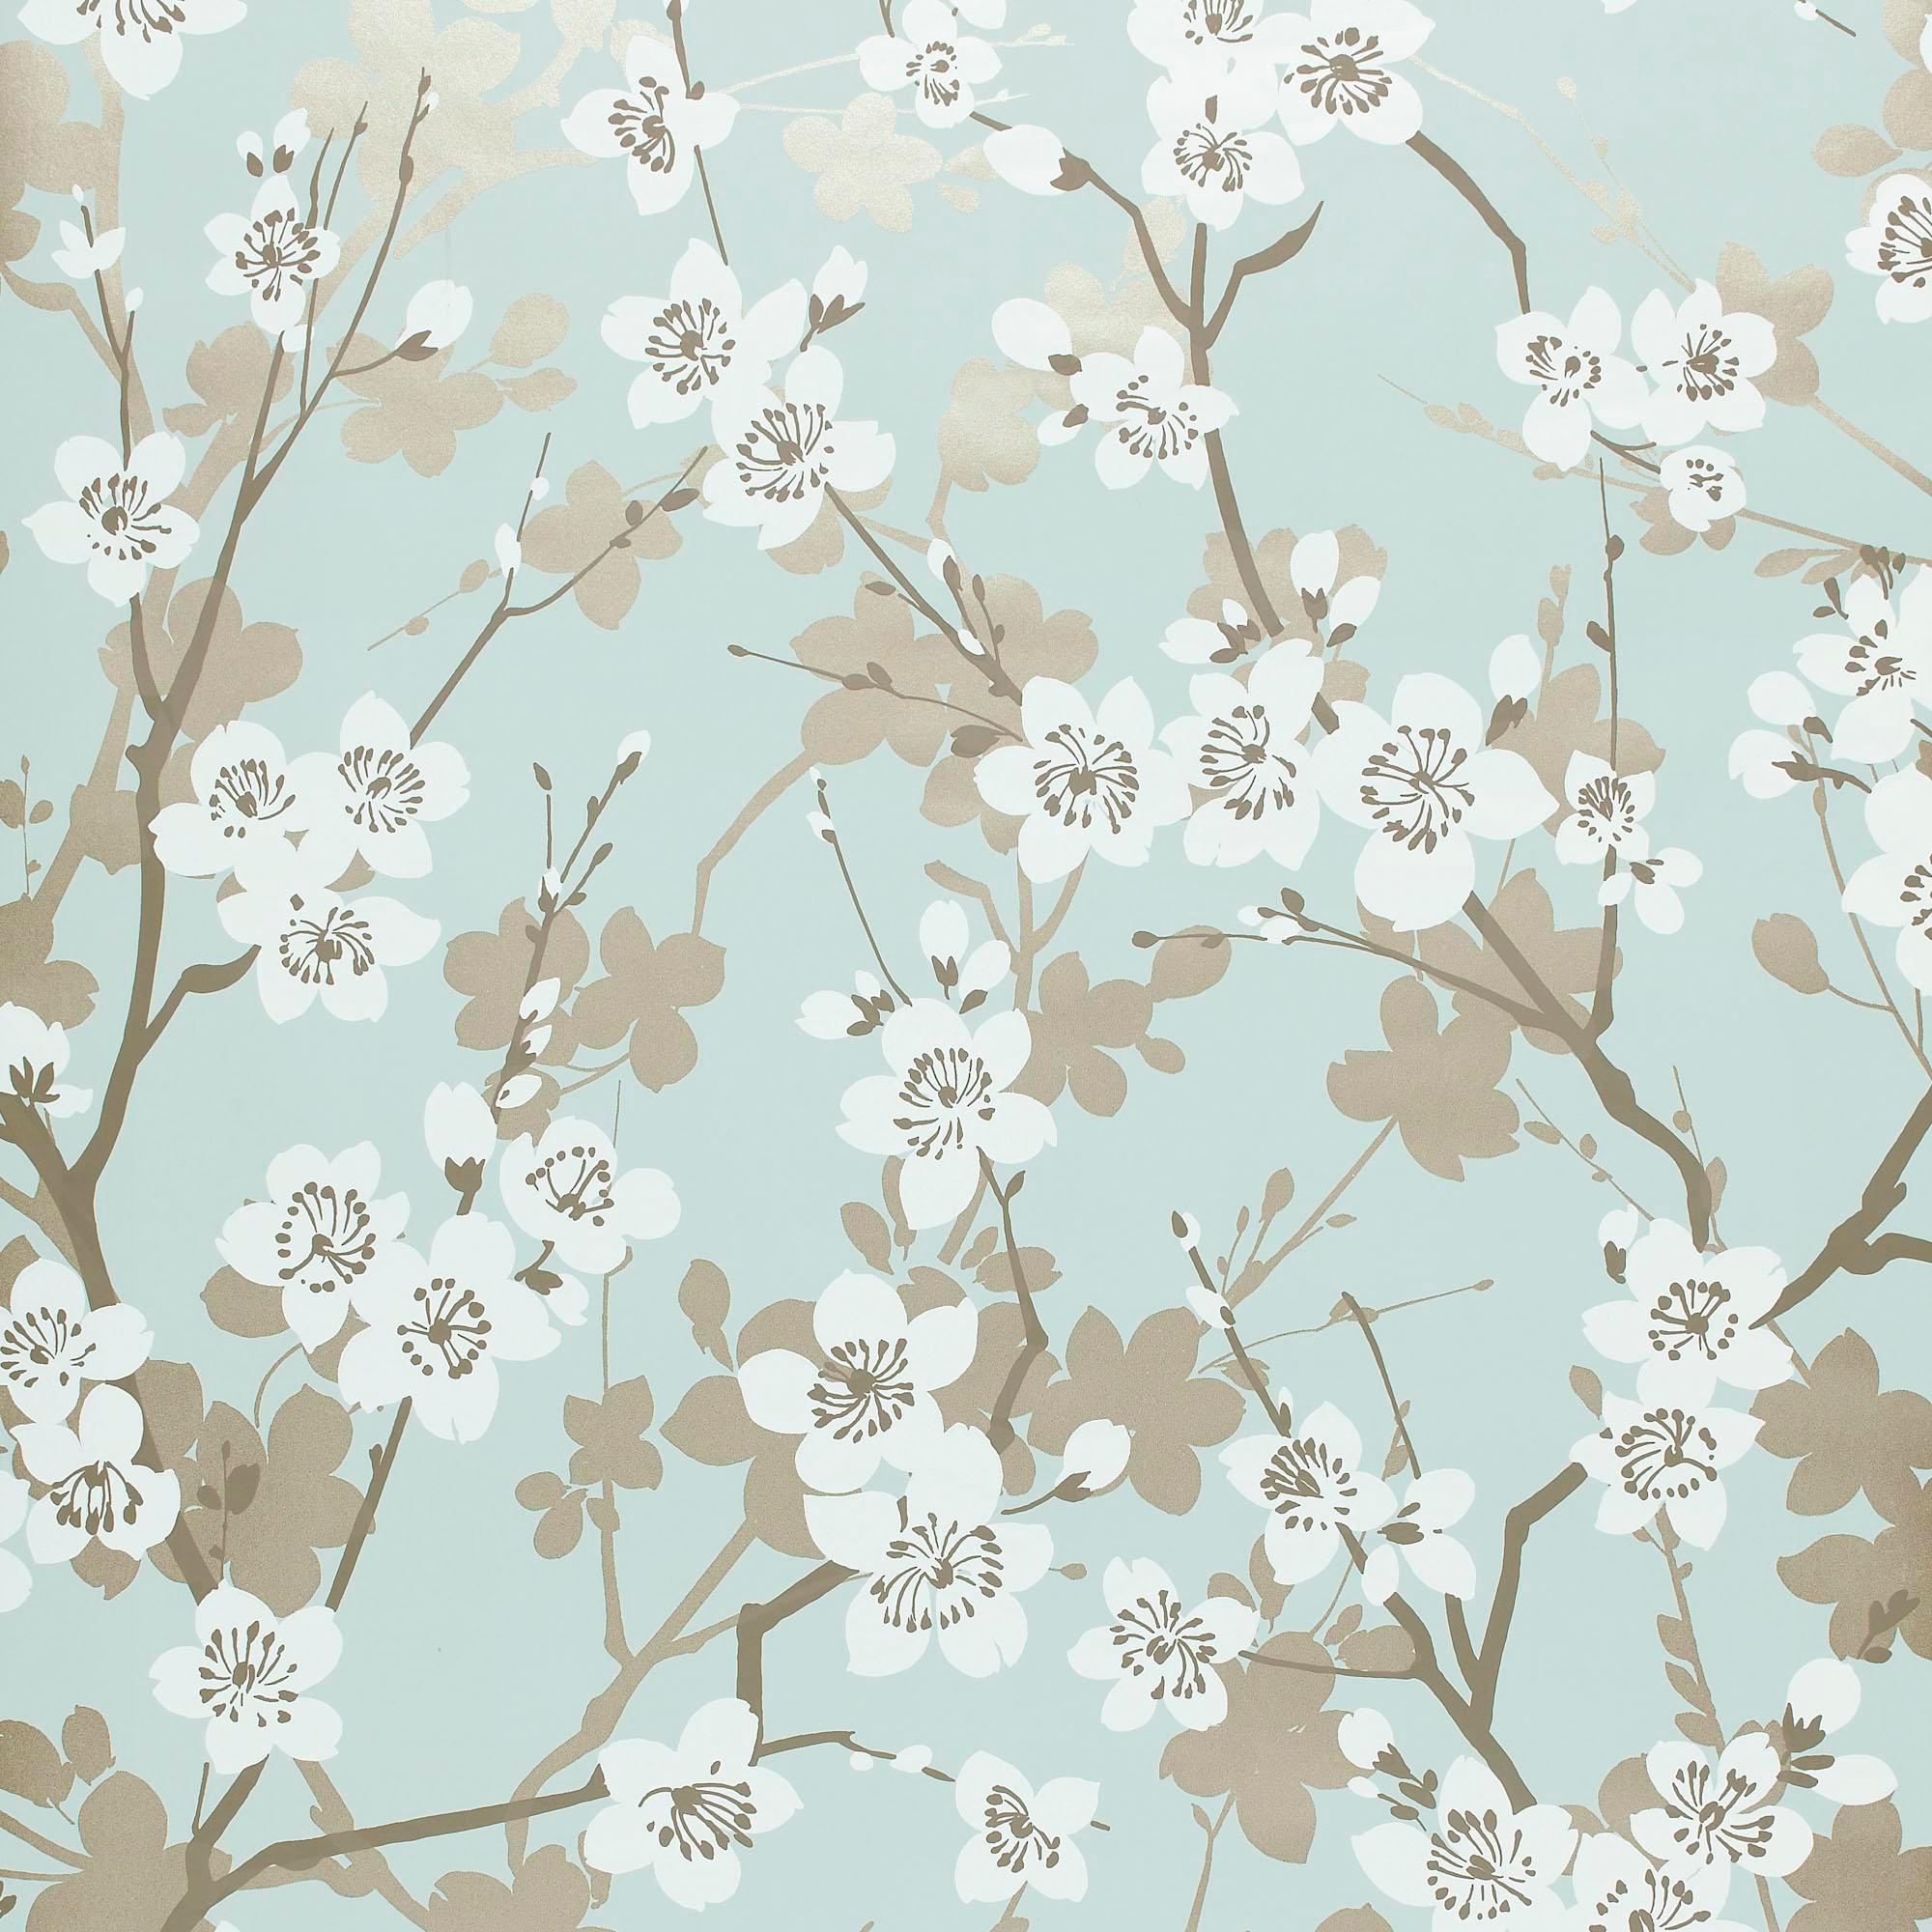 Schumacher Ming Cherry Blossom Wallpaper In Aqua Chairish